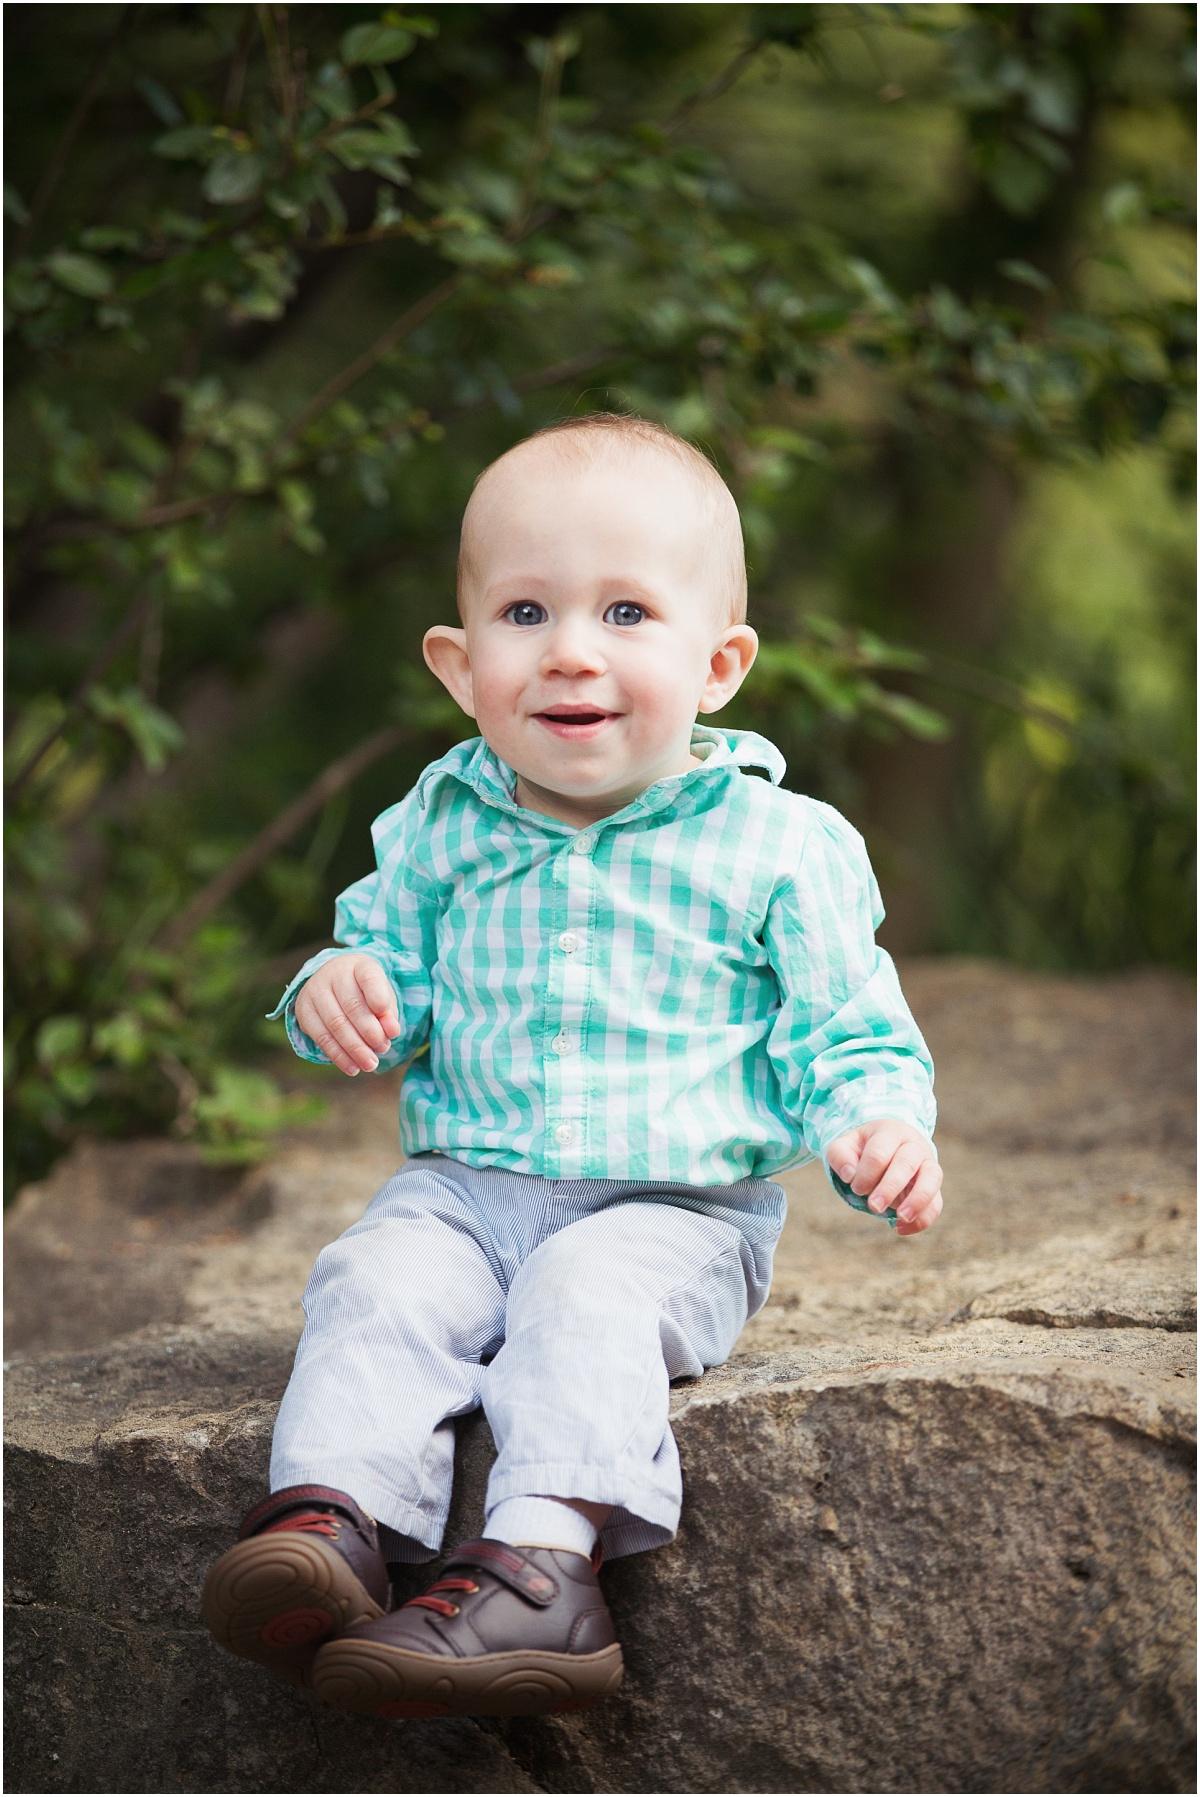 Portraits_Child Photography_Meridian Idaho__Leah Southwick Photography_0109.jpg